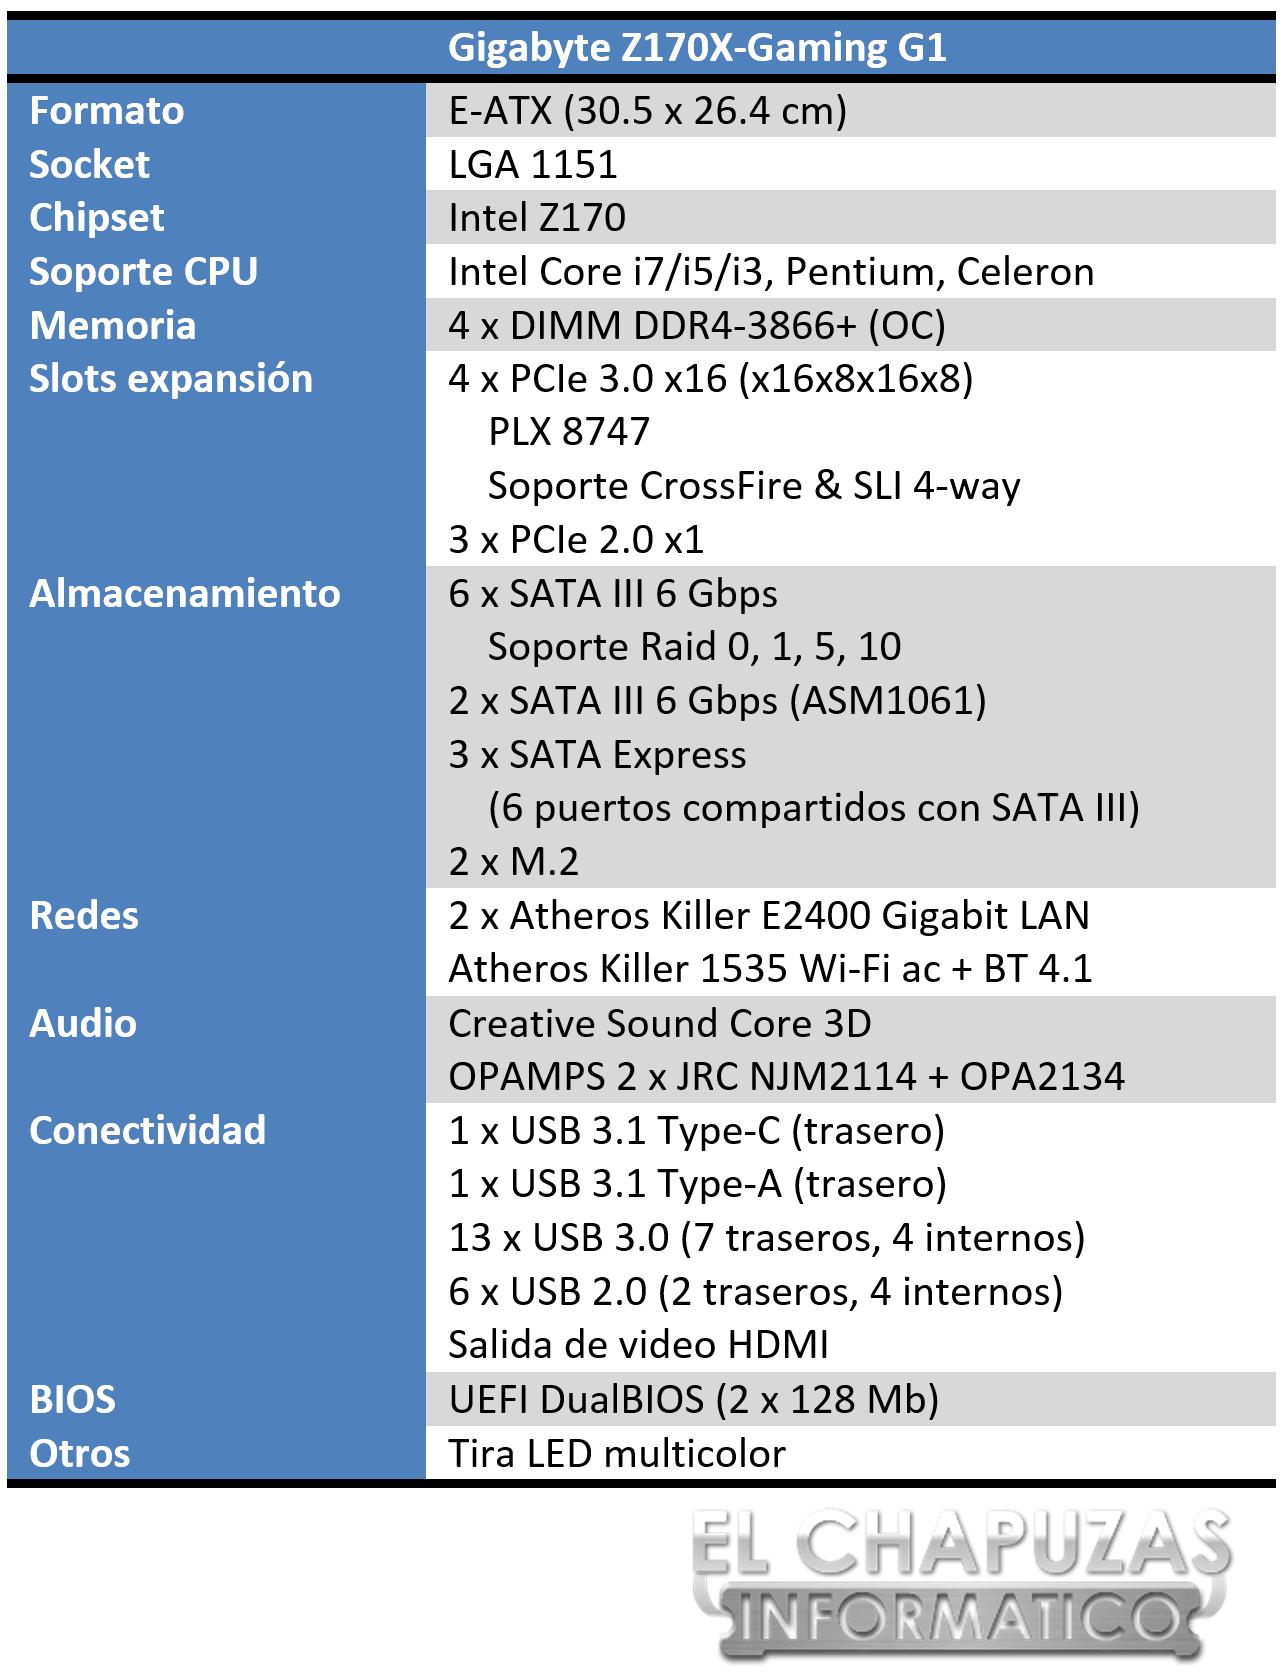 Gigabyte Z170X-Gaming G1 Especificaciones